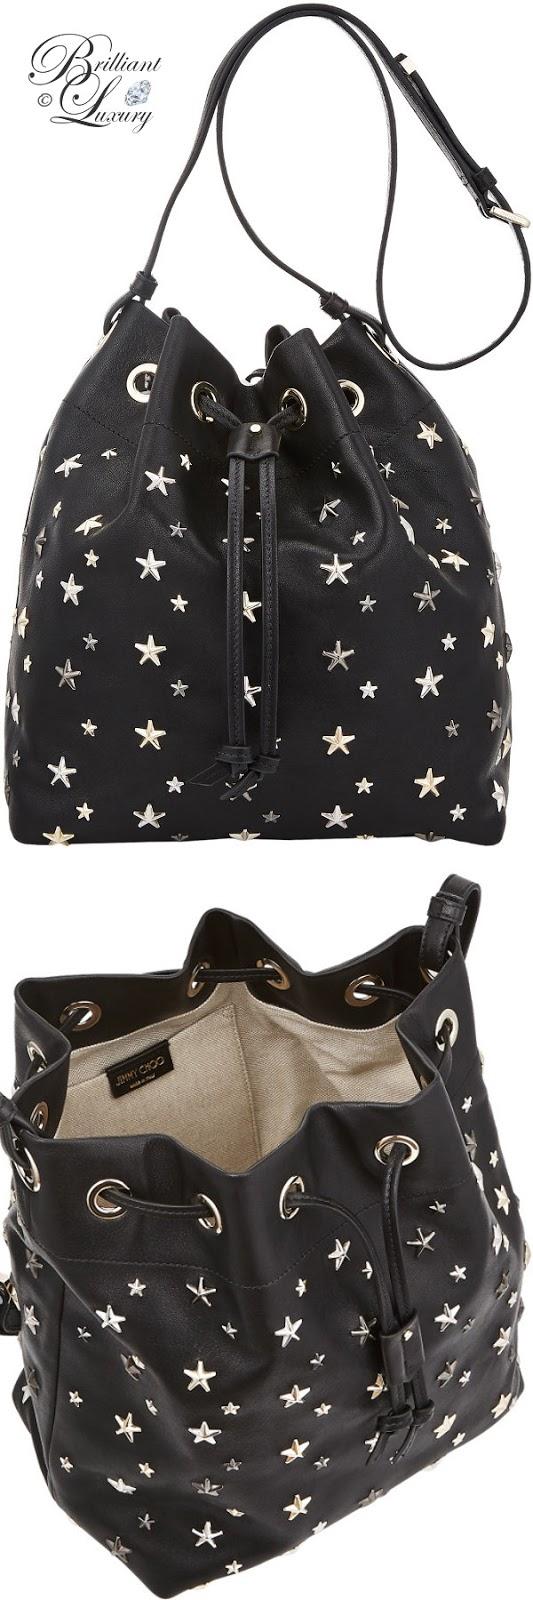 optimized pins Brilliant Luxury ♦ Jimmy Choo Juno Black and Metallic Leather Drawstring Bag with Multimetal Star Detailing #brilliantluxury